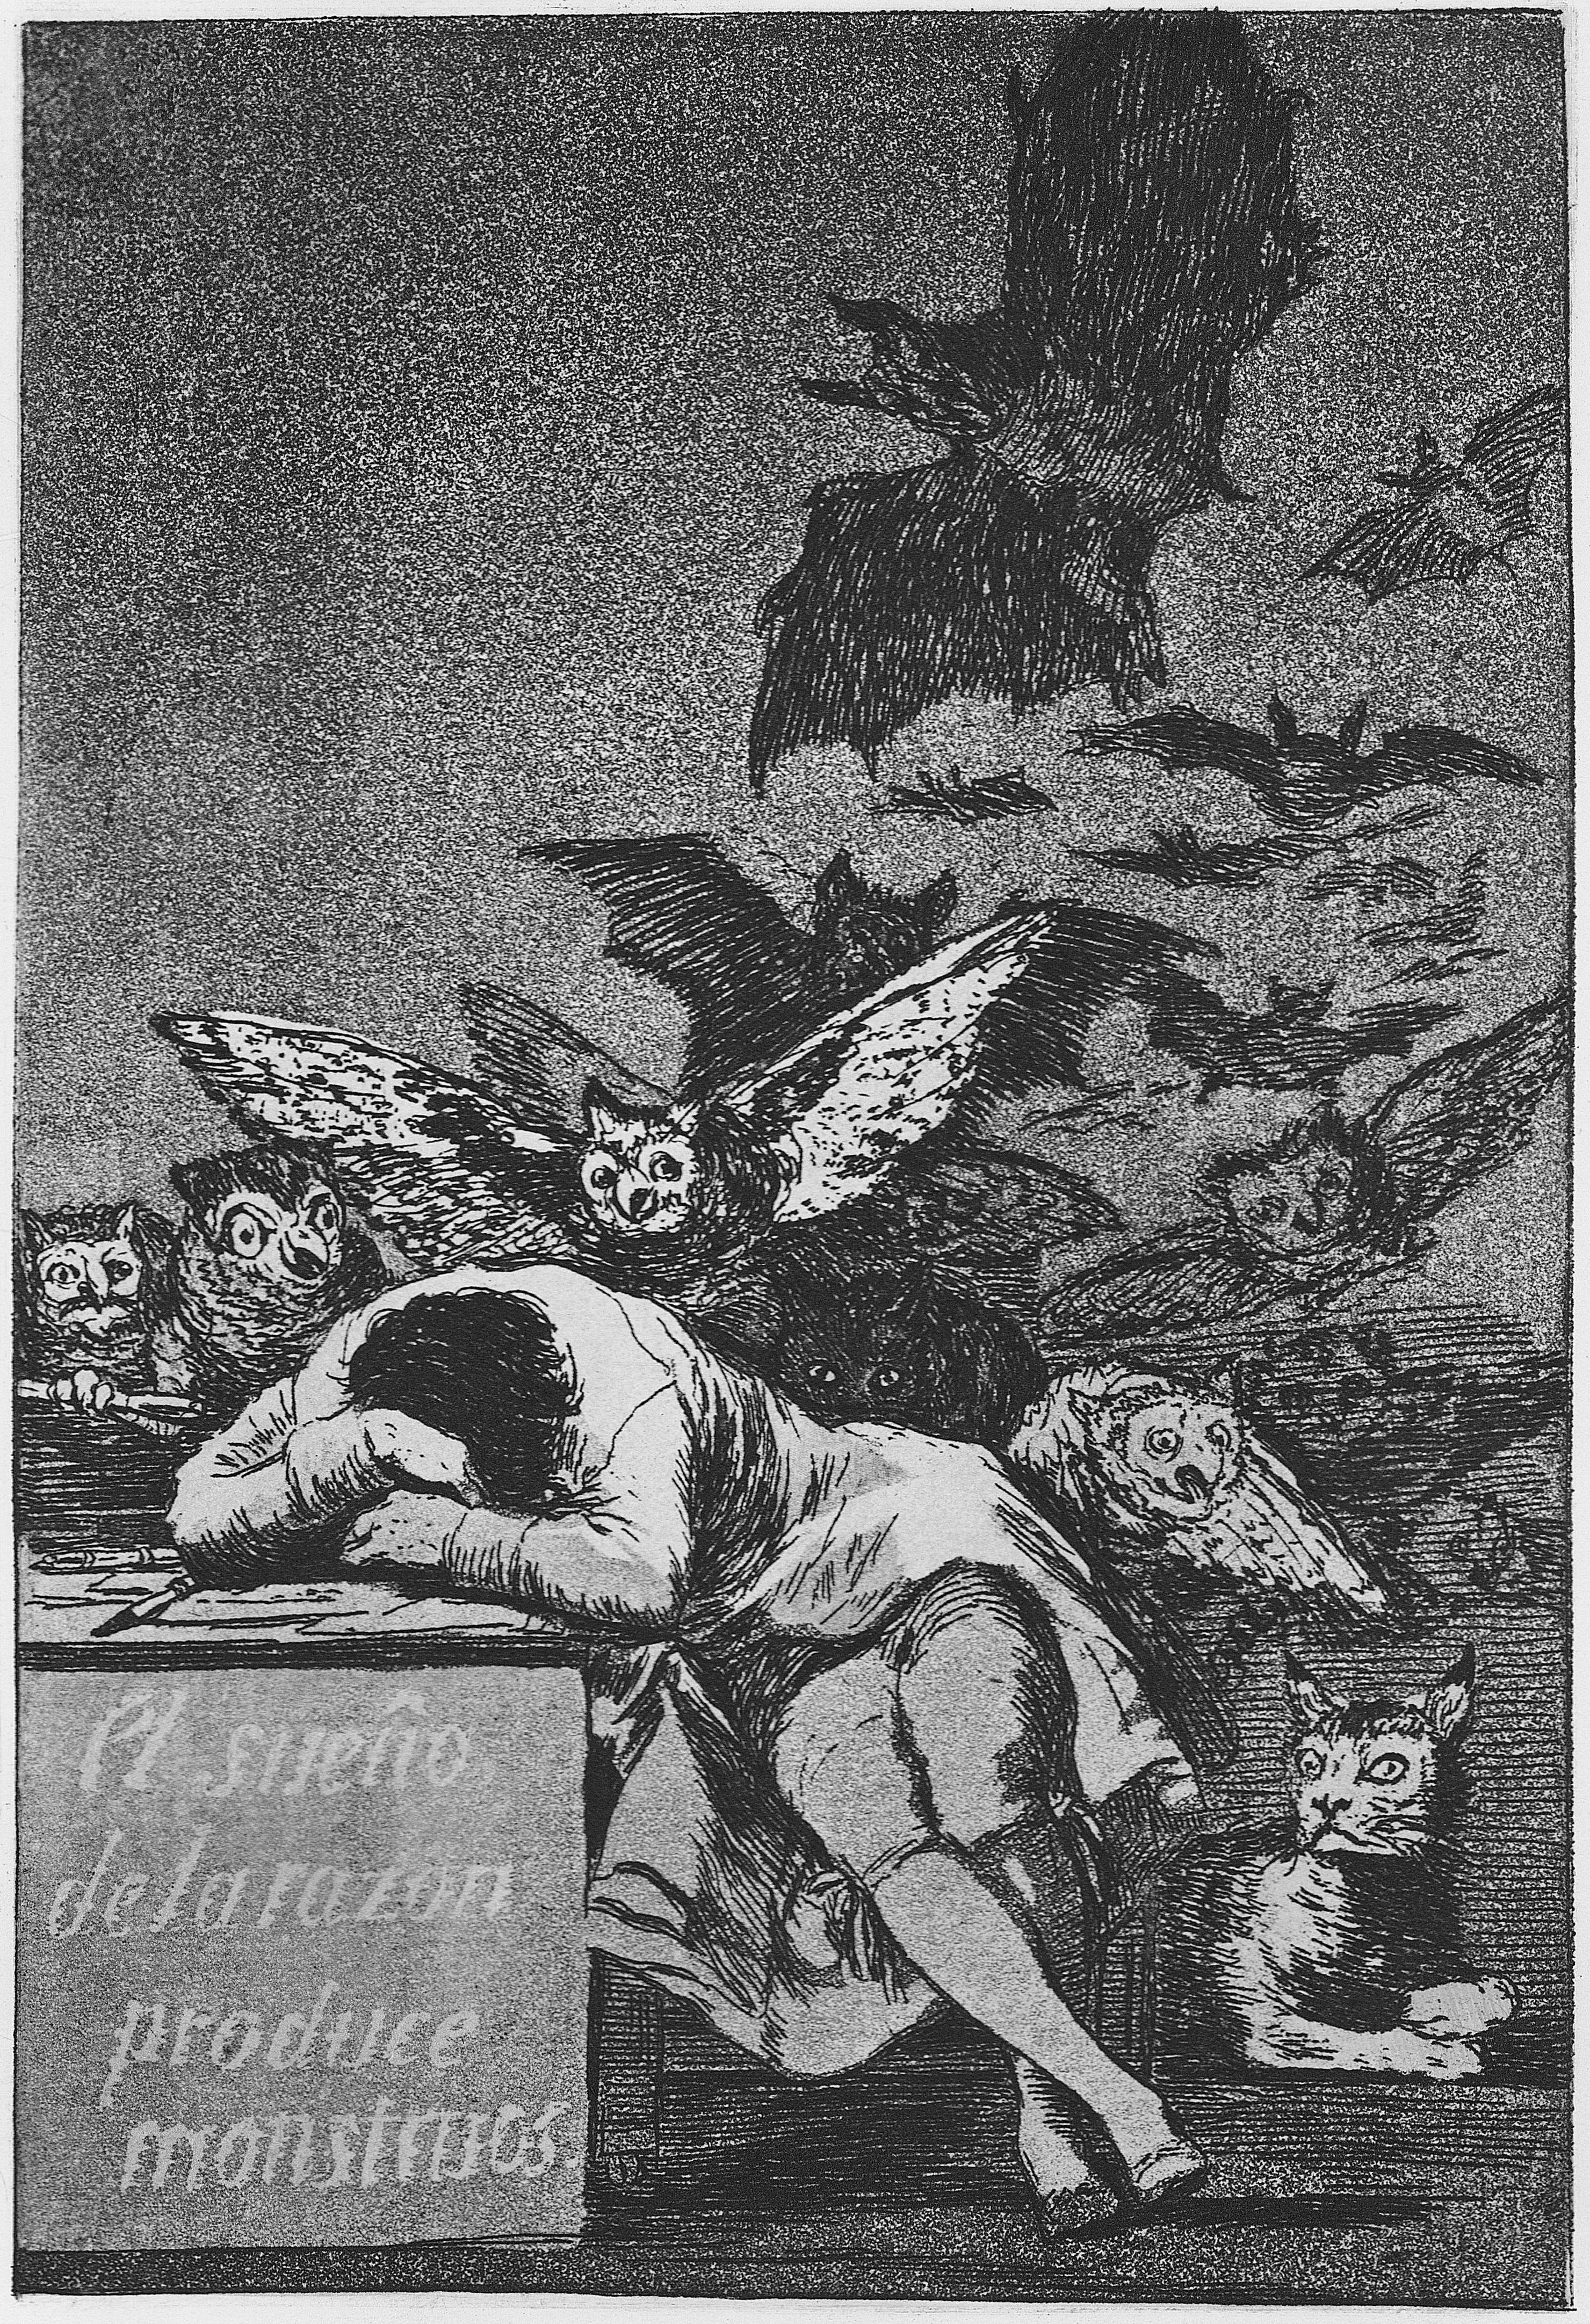 [Image: Goya_-_Caprichos_%2843%29_-_Sleep_of_Reason.jpg]